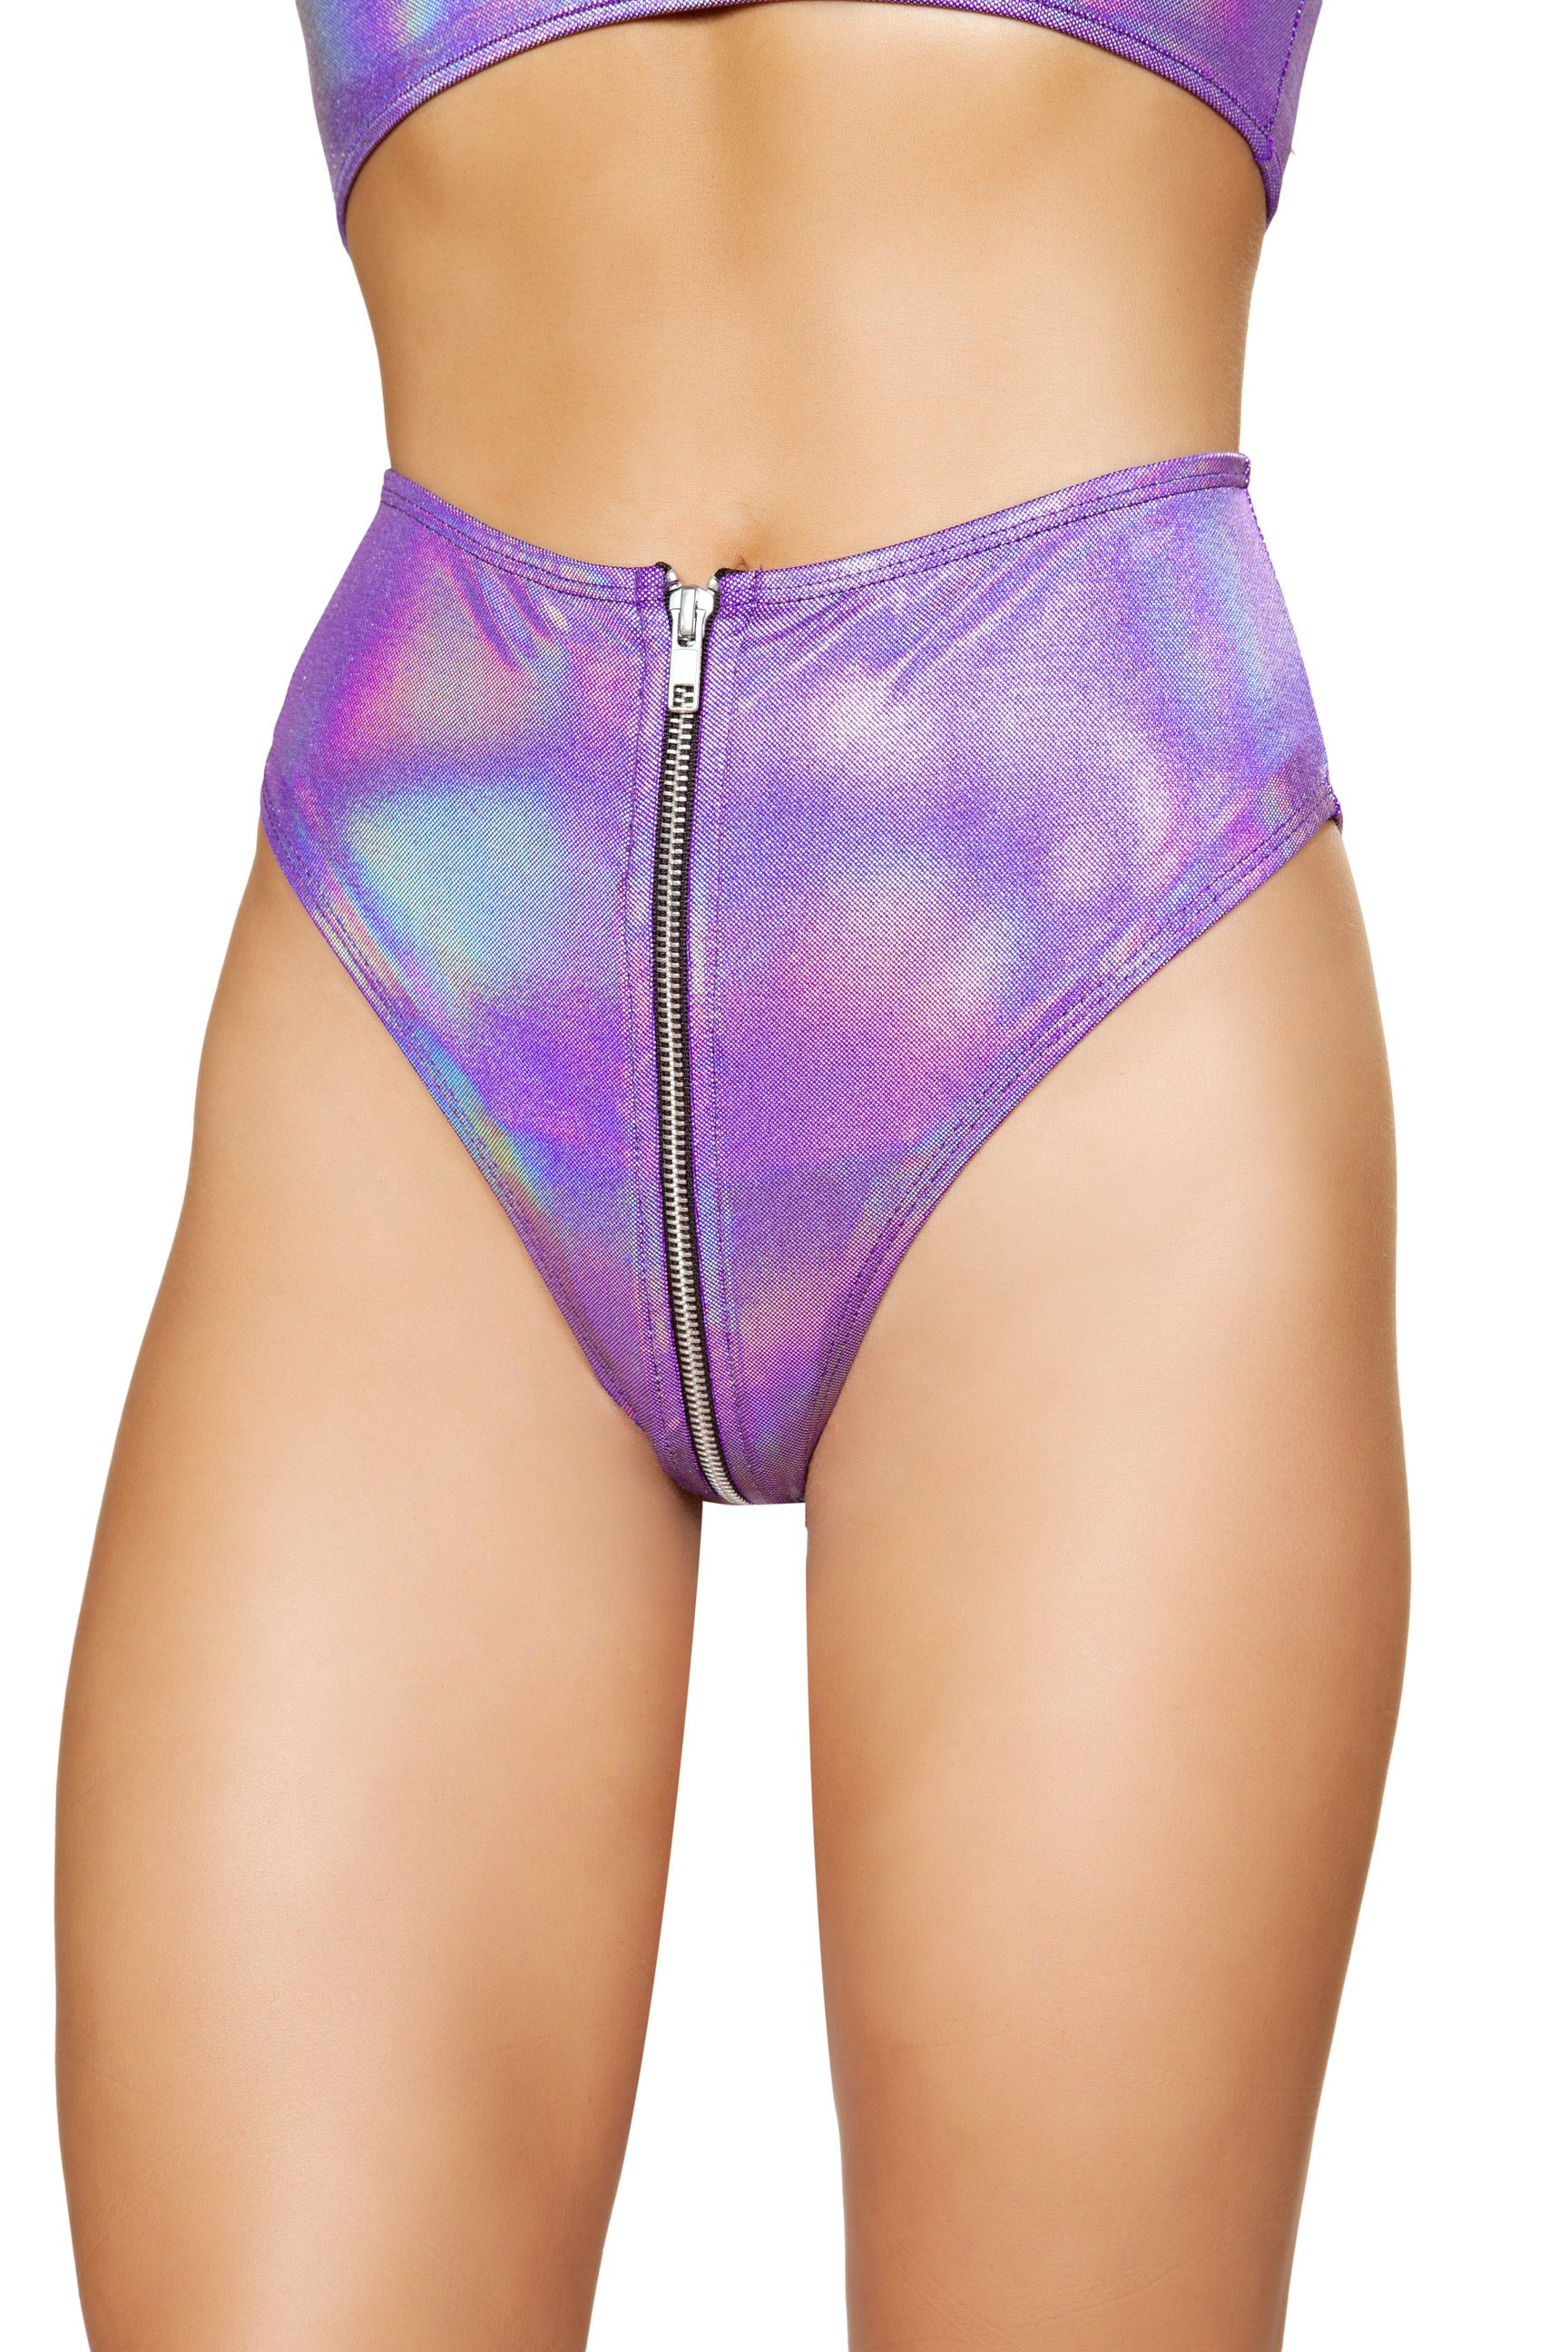 Spandex high waisted shorts front zipper 3538 Edmonton